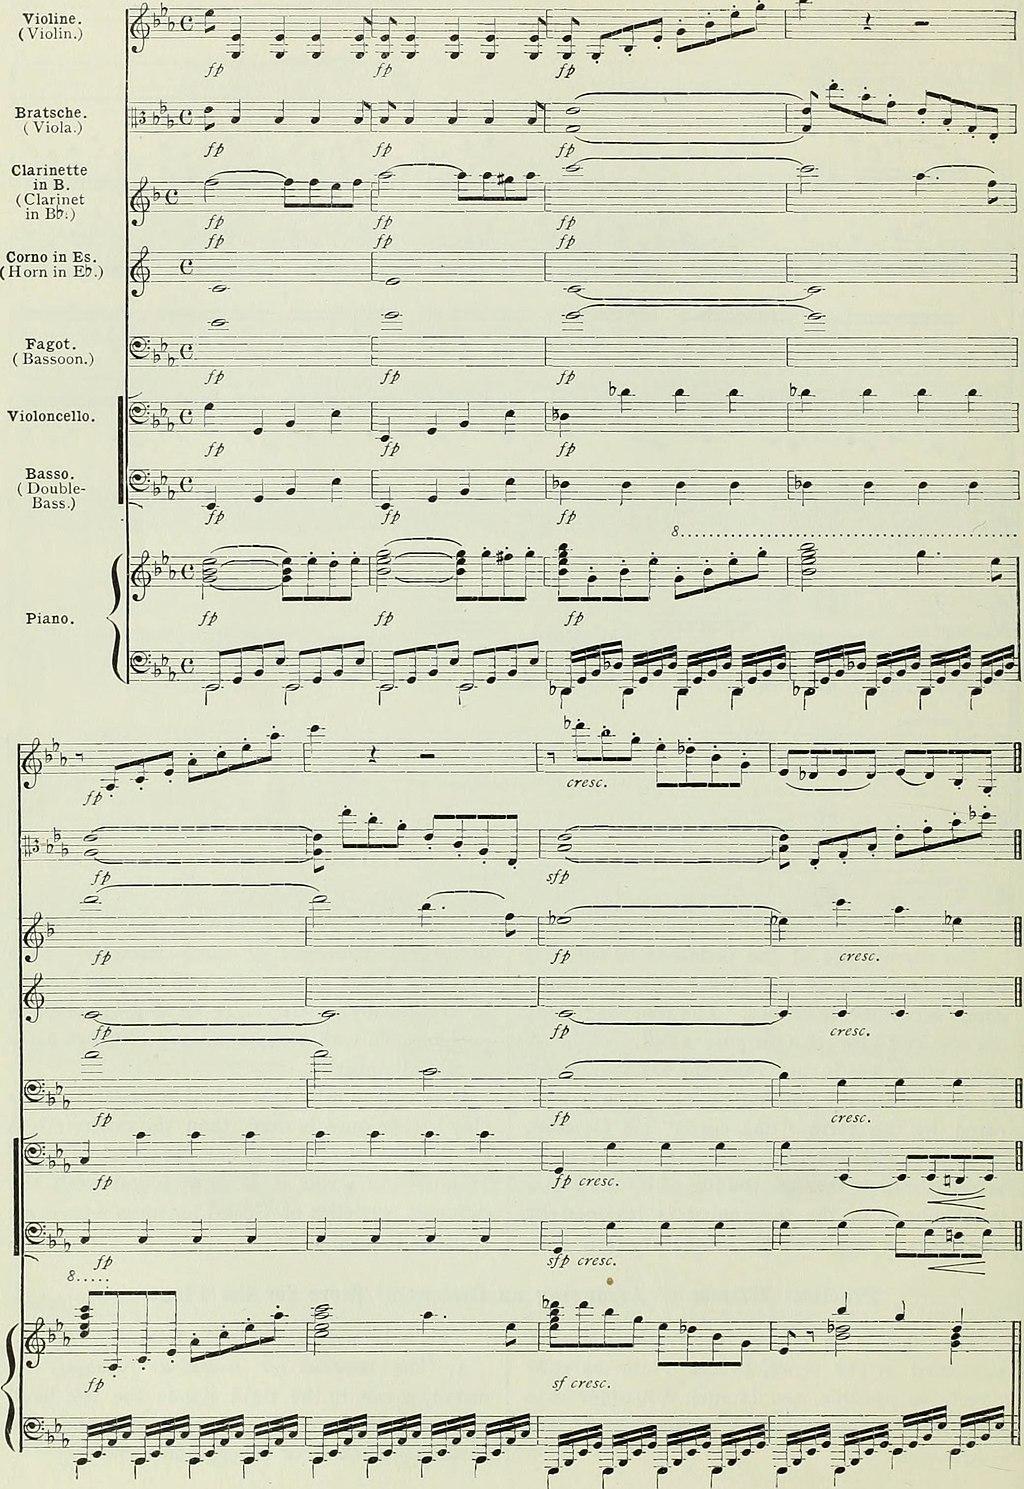 orchestral score.jpg